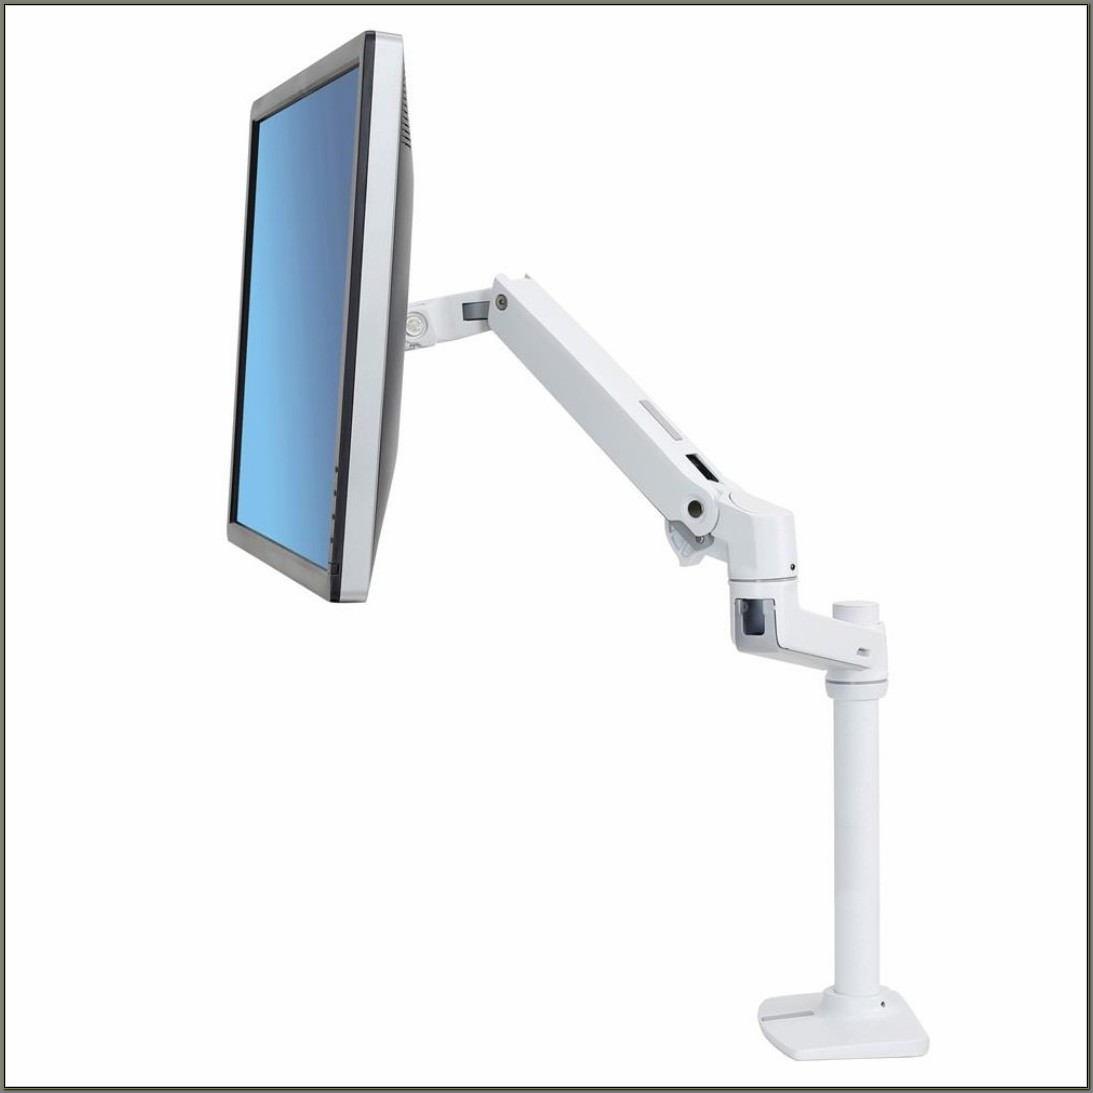 Lx Desk Mount Lcd Arm Tall Pole